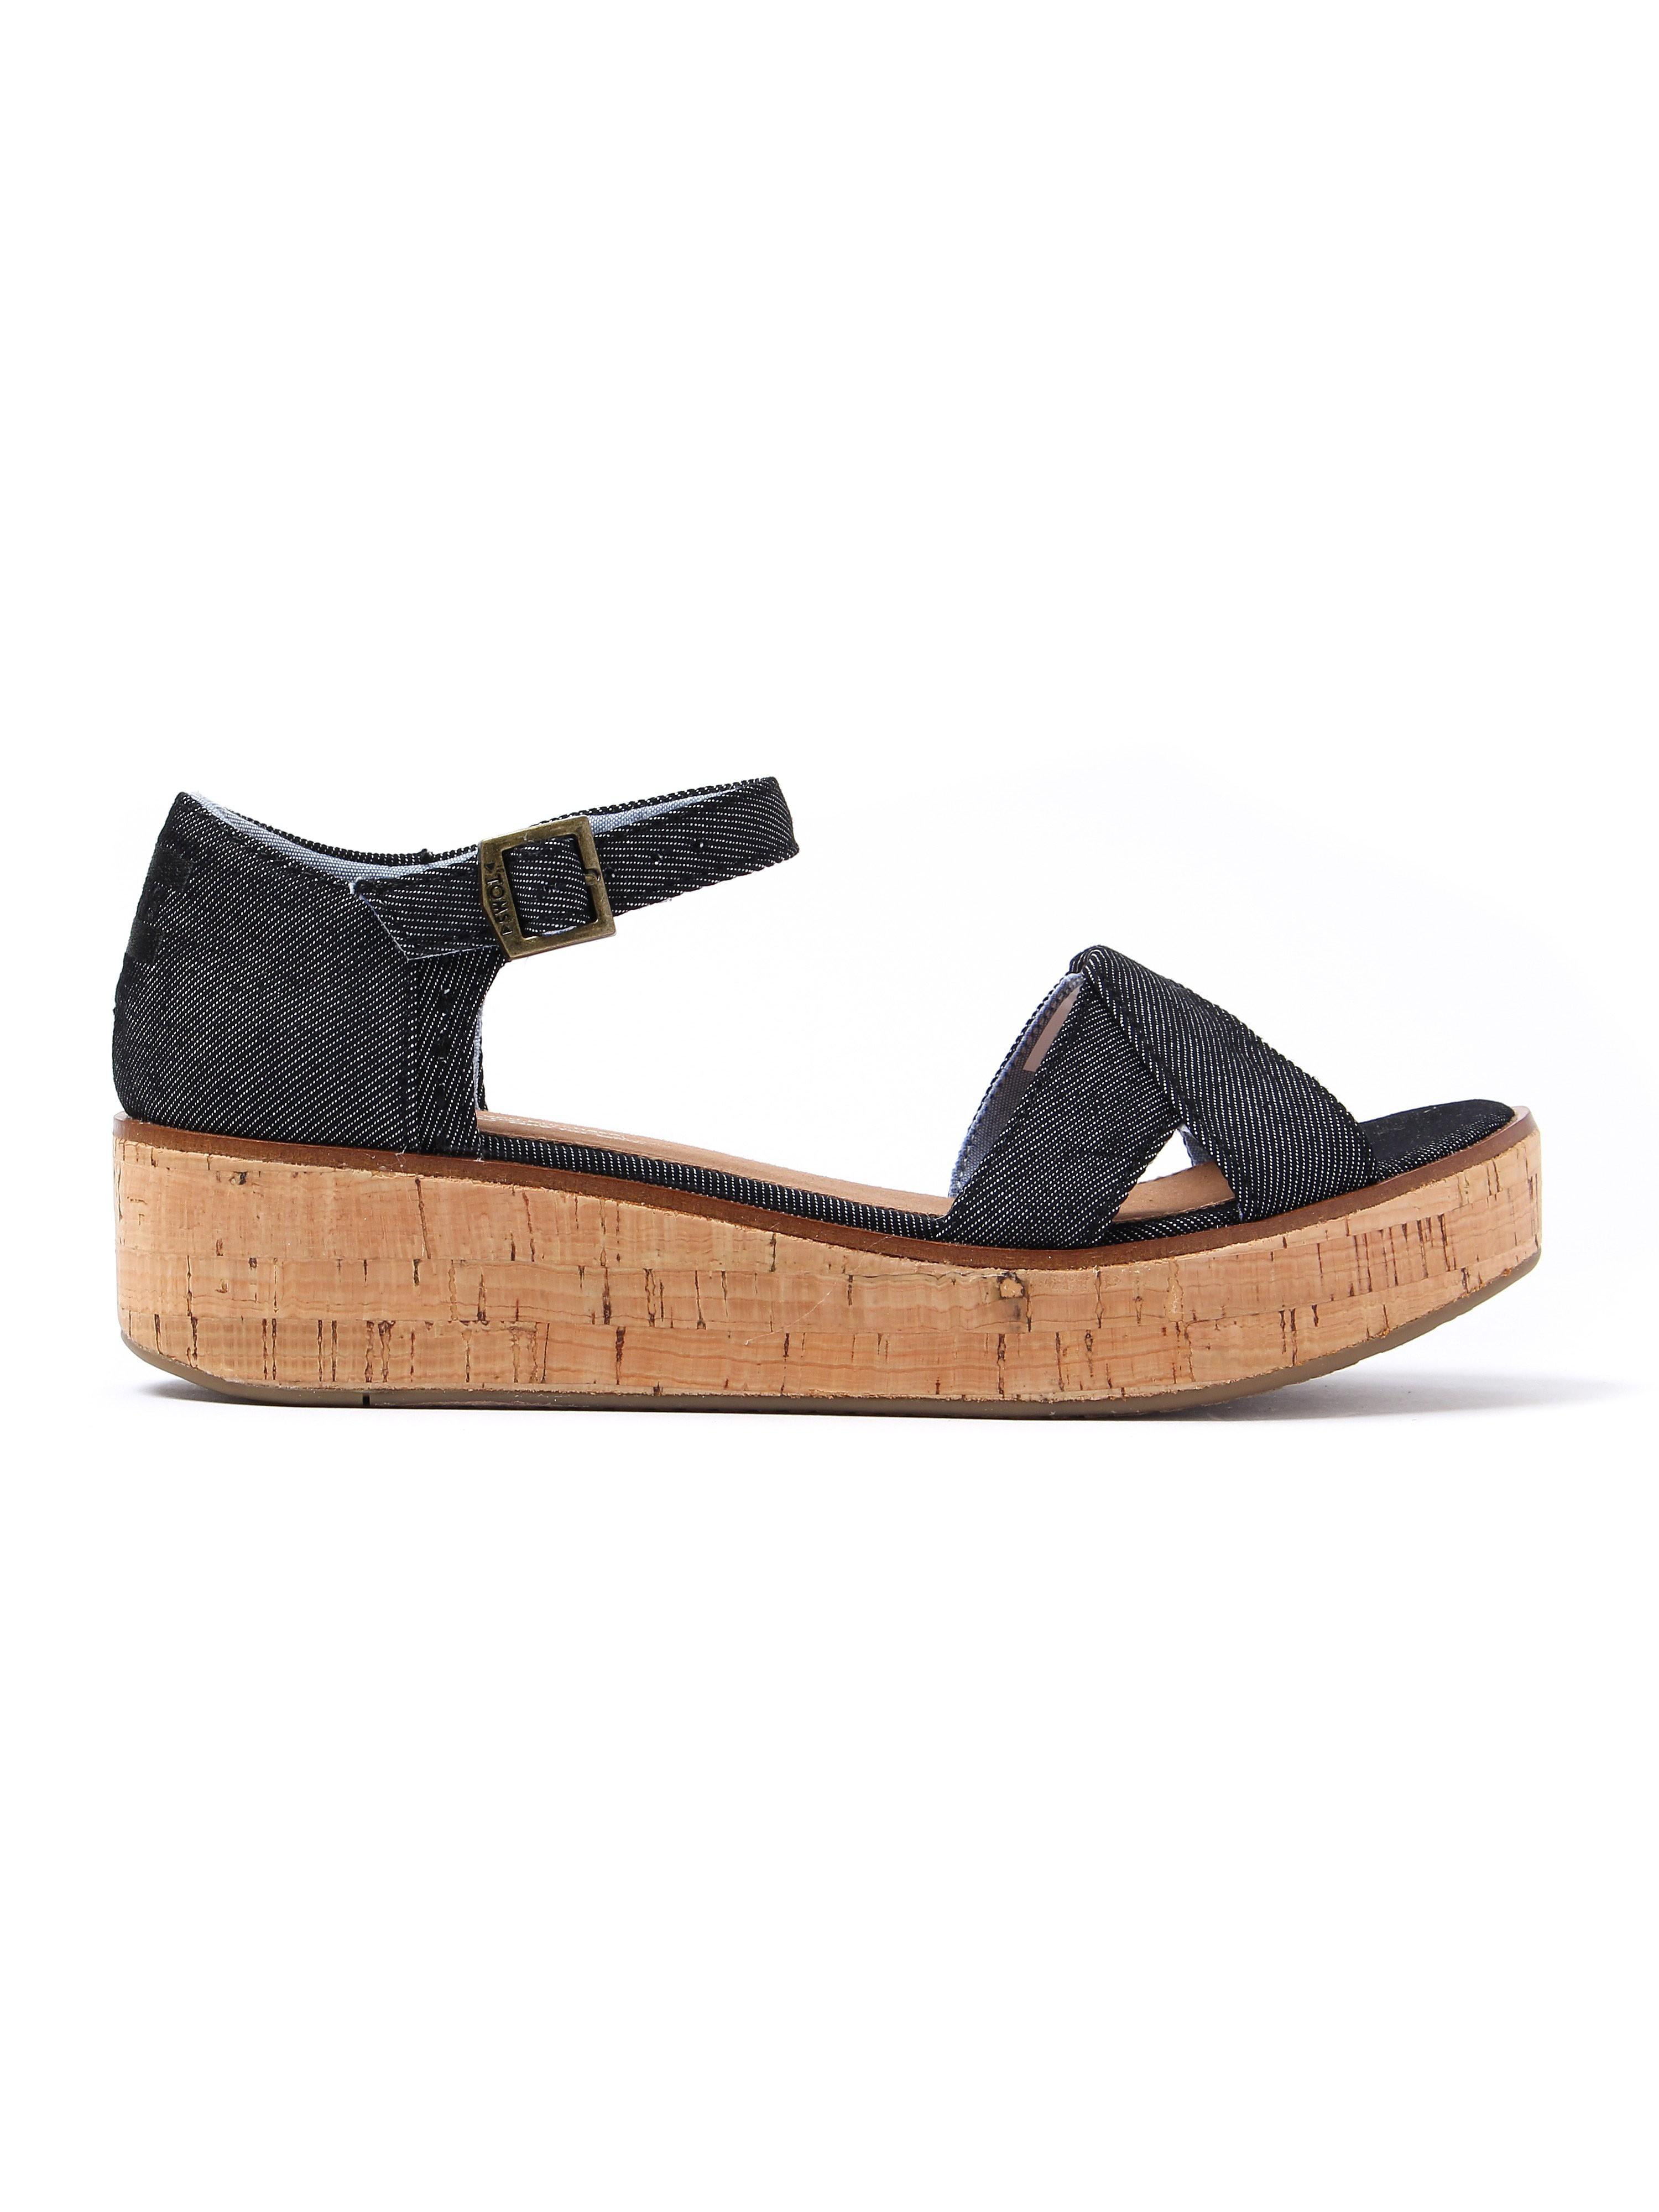 Toms Women's Harper Wedge Sandals - Black Denim